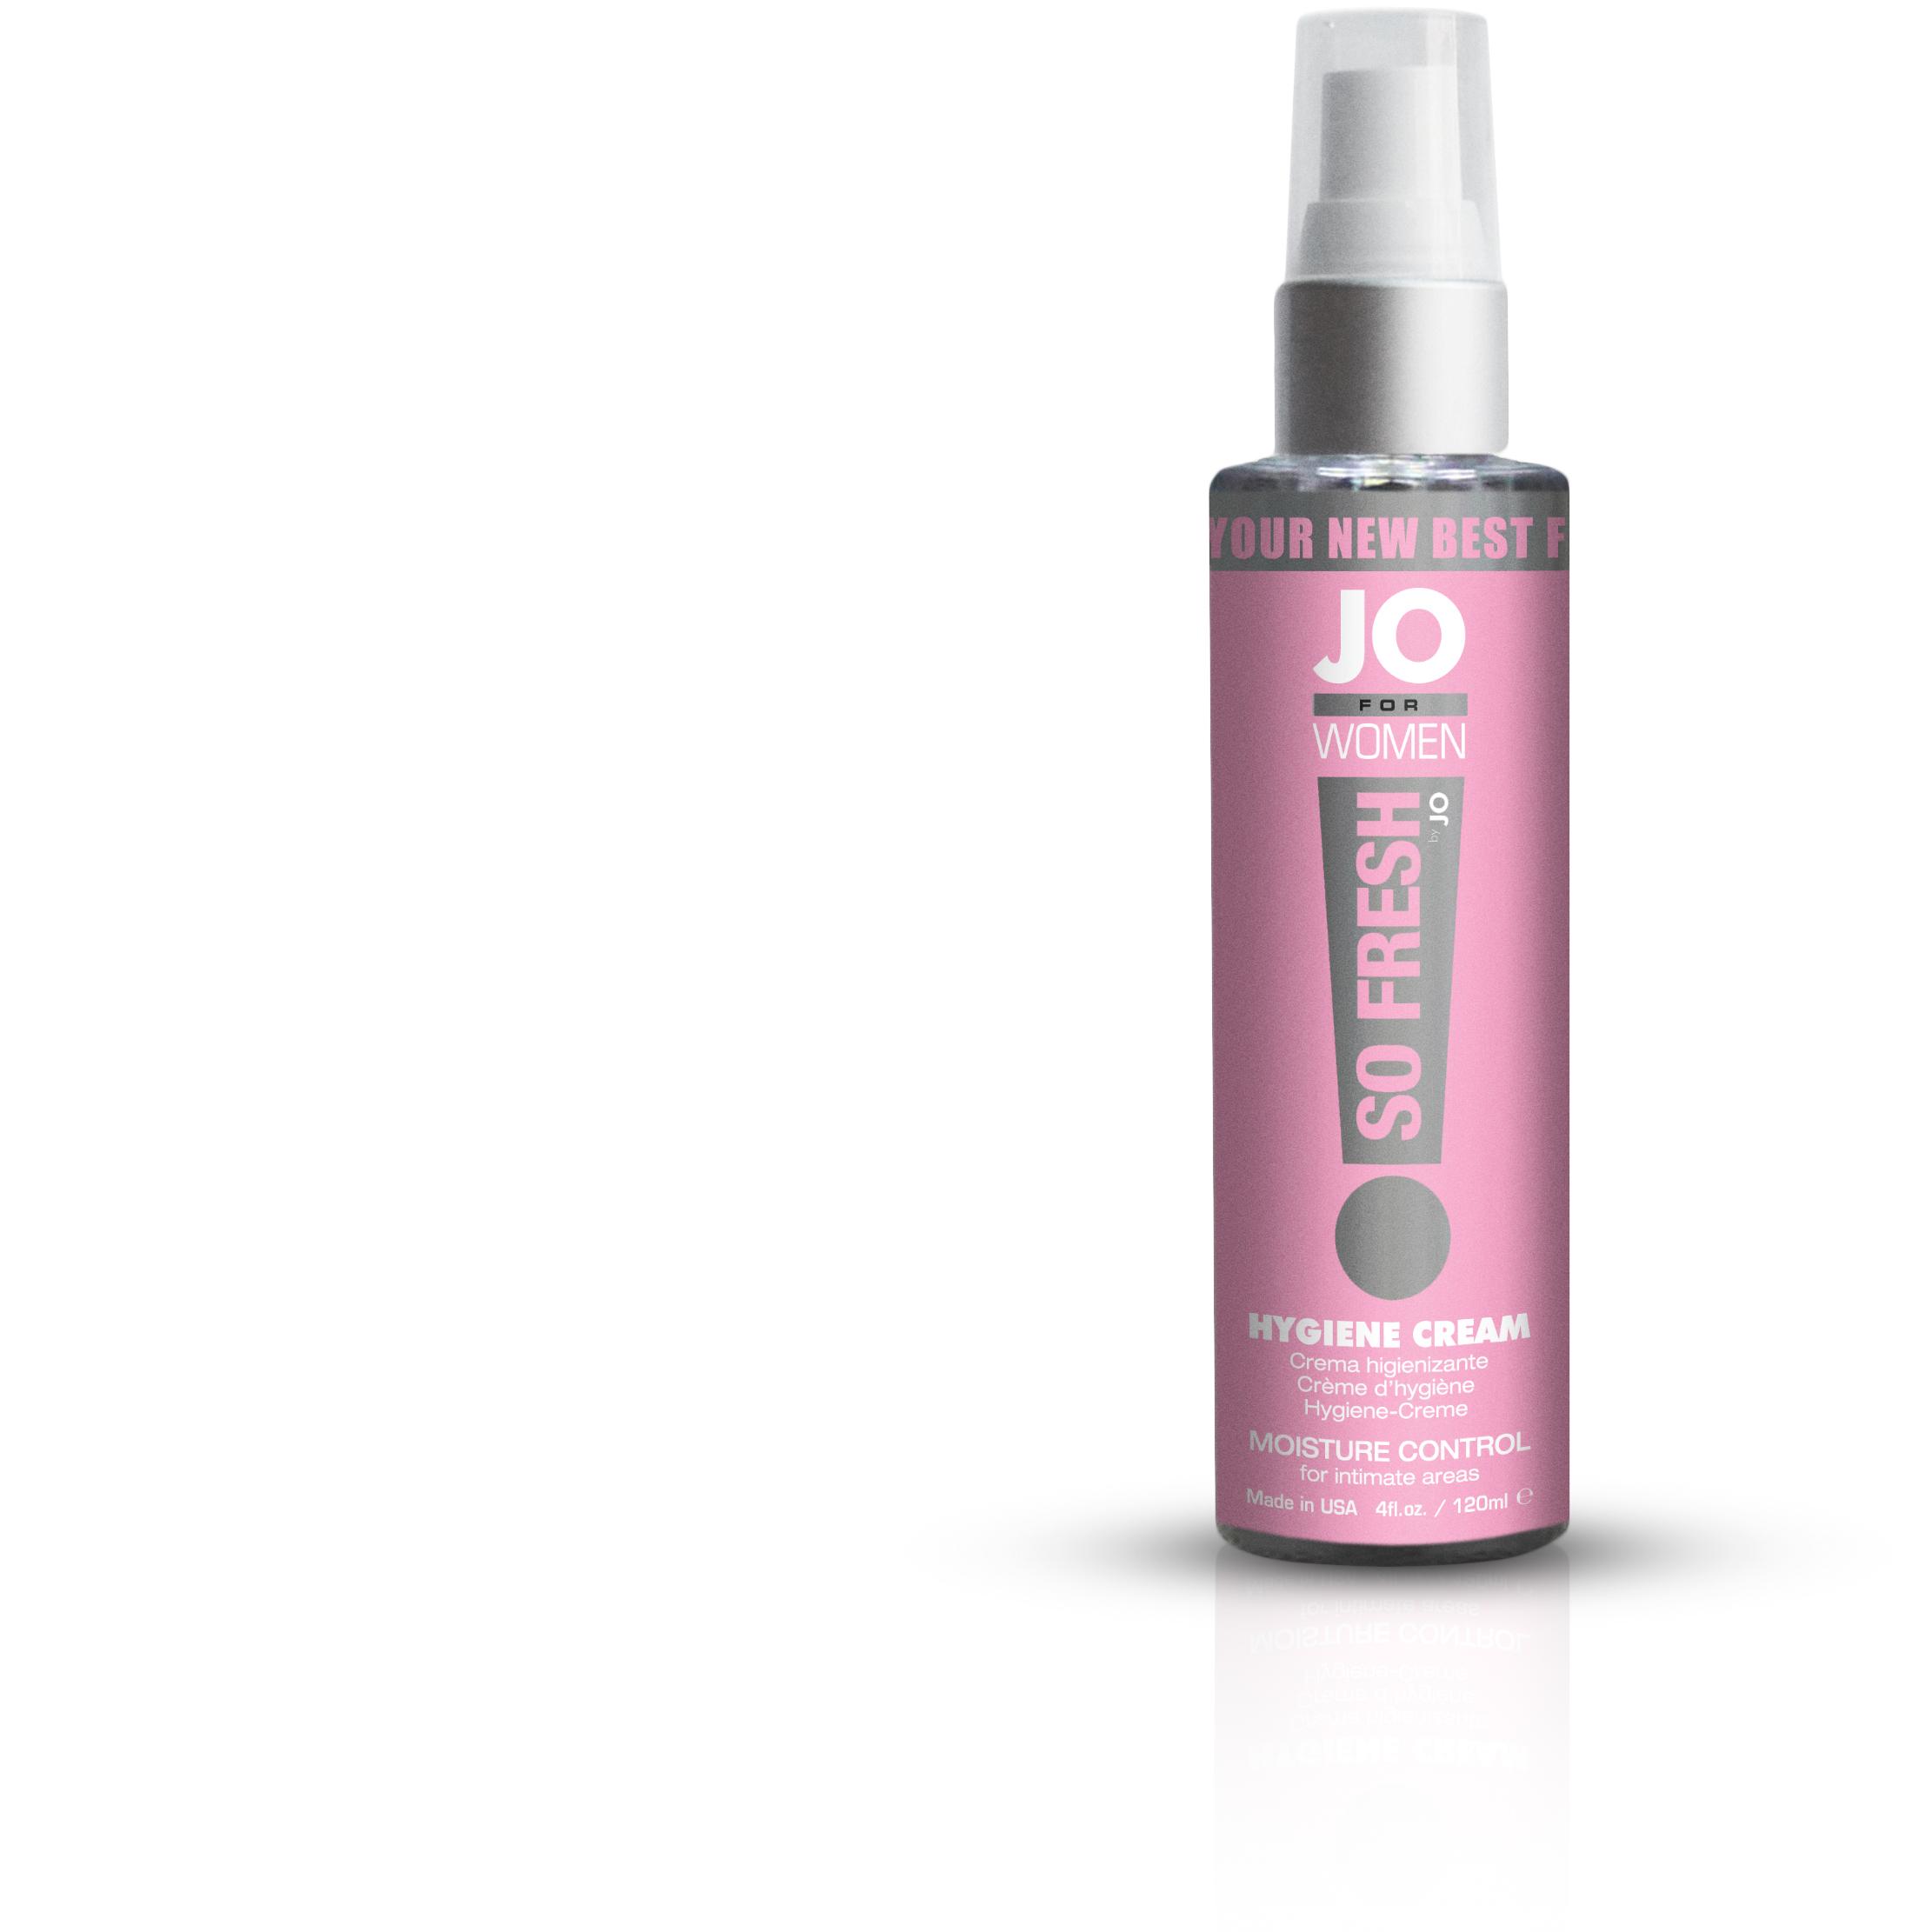 40227_JO_so_fresh_hygiene_cream_4oz_womens.jpg